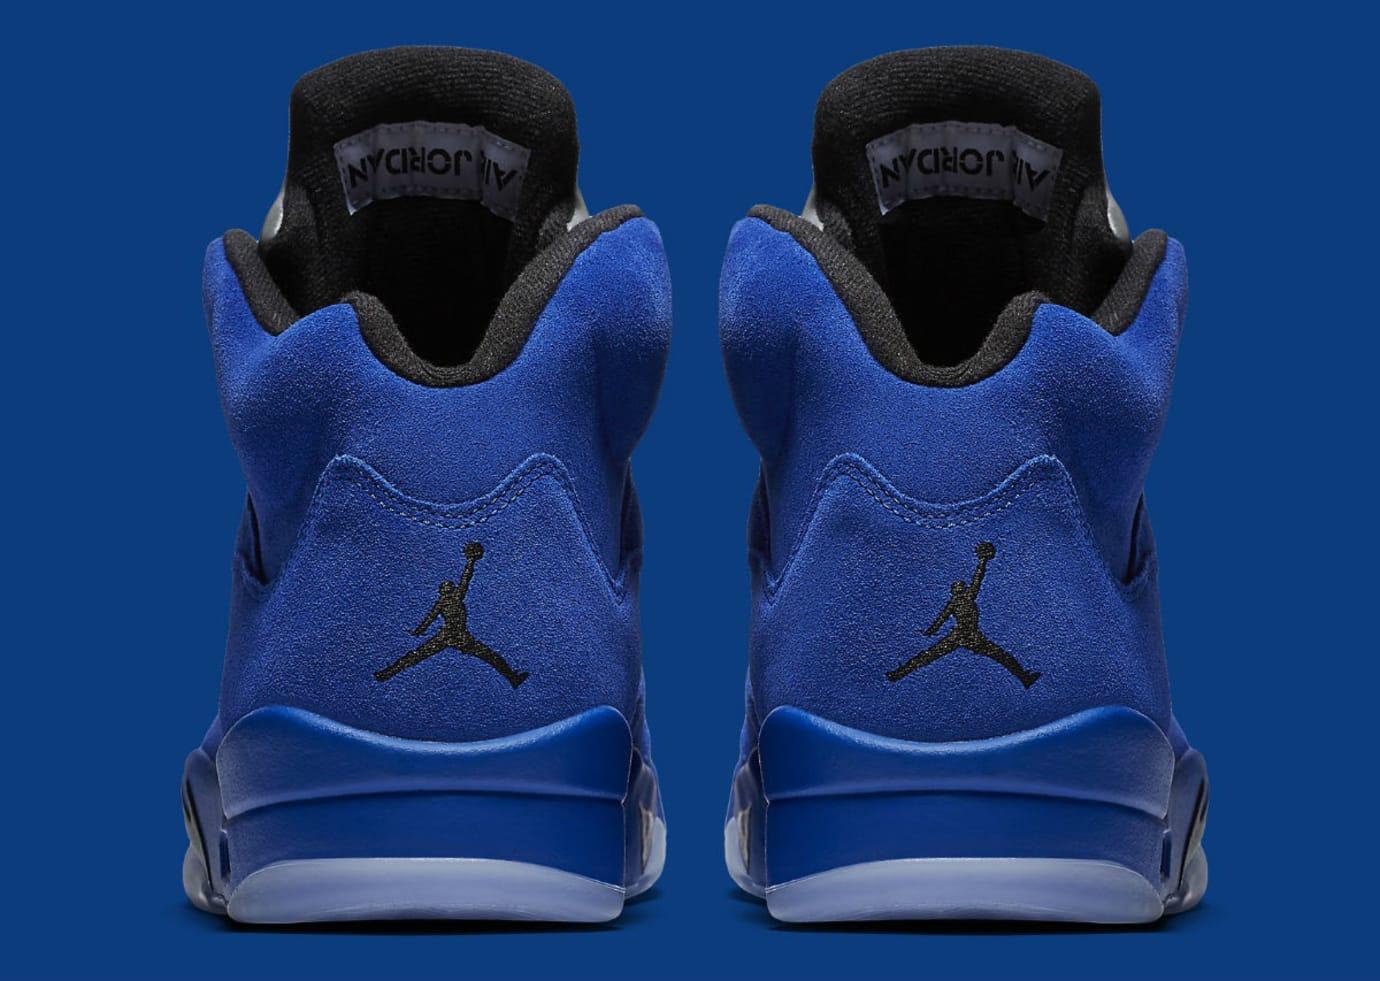 e2954774f00b75 Air Jordan 5 Royal Blue Suede Flight Suit Release Date Heel 136027-401